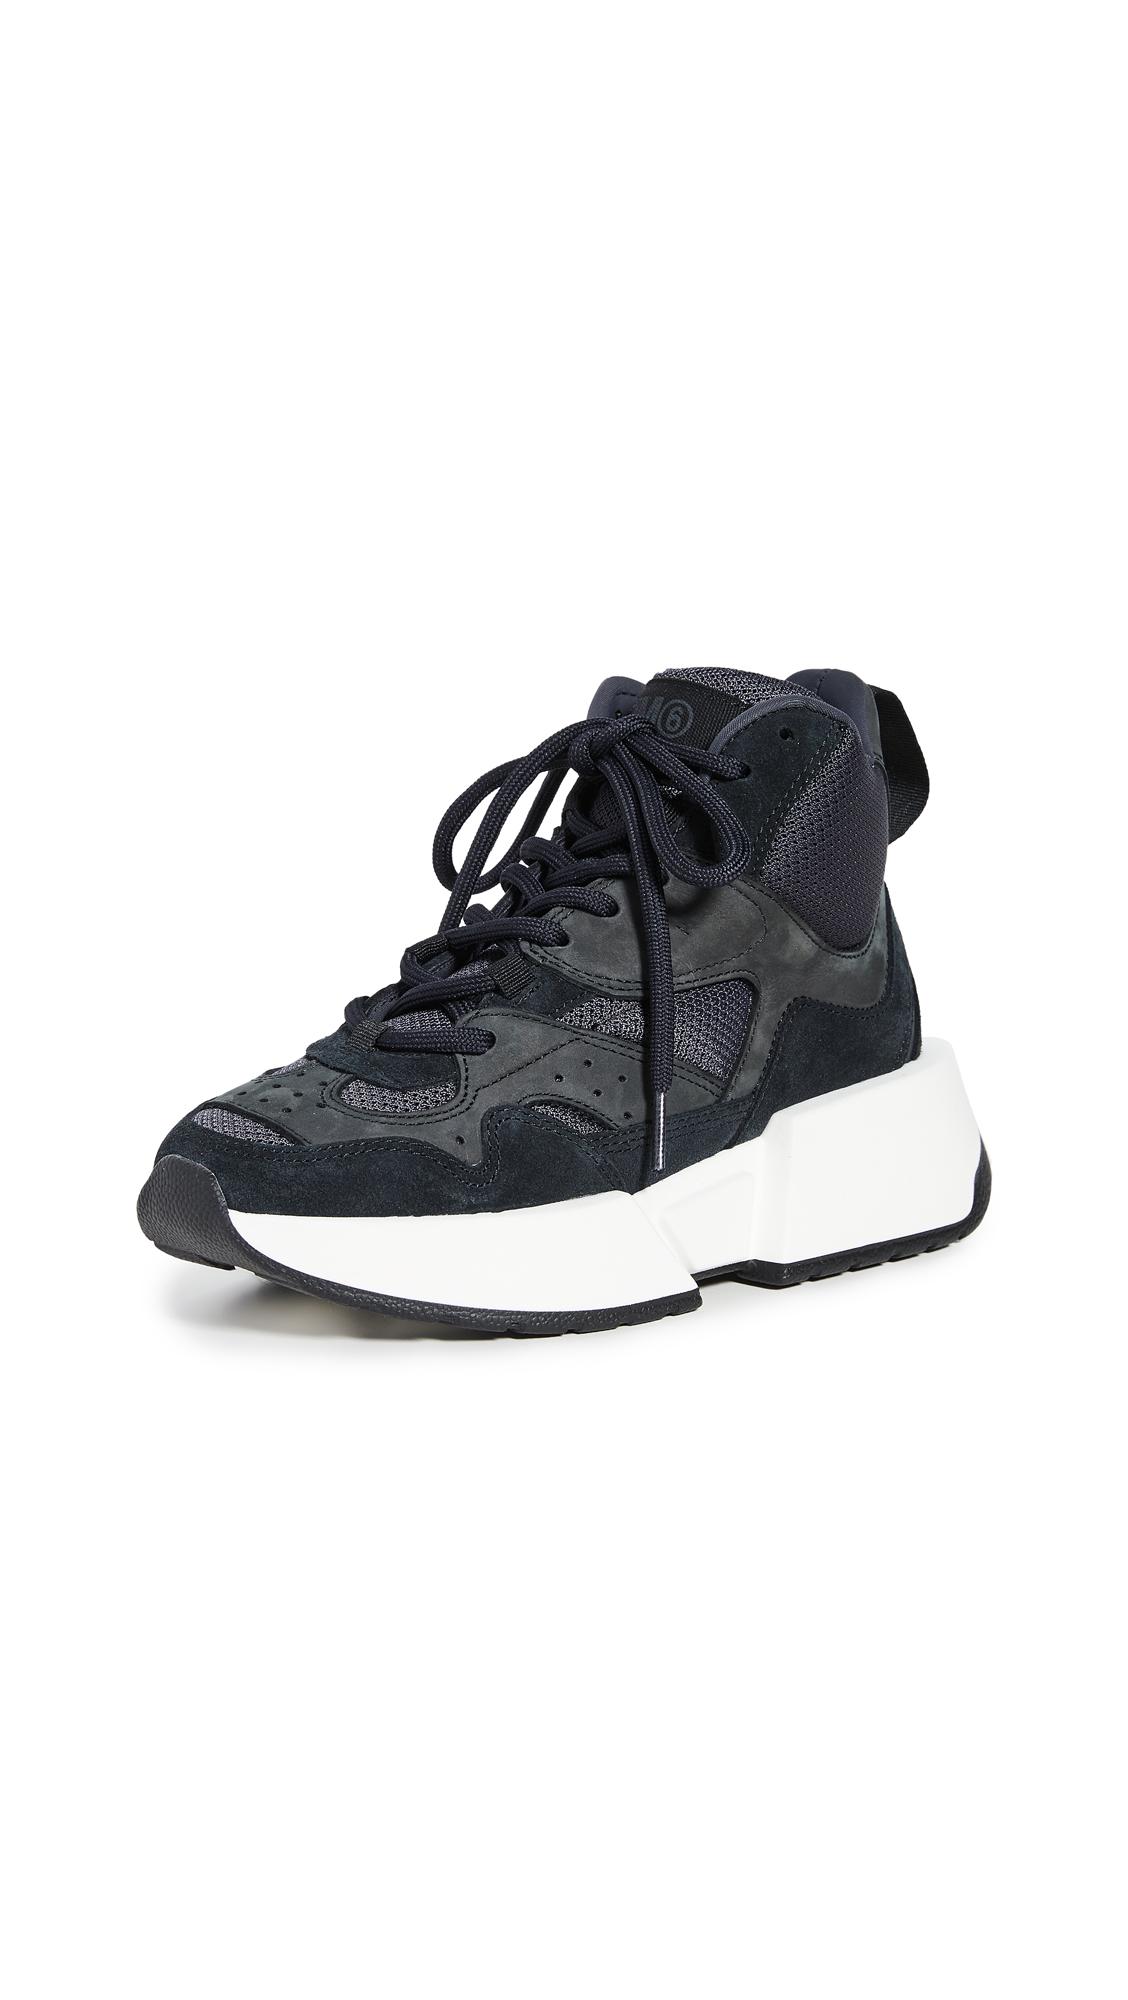 Mm6 Maison Margiela Shoes HIGH TOP TRAINERS